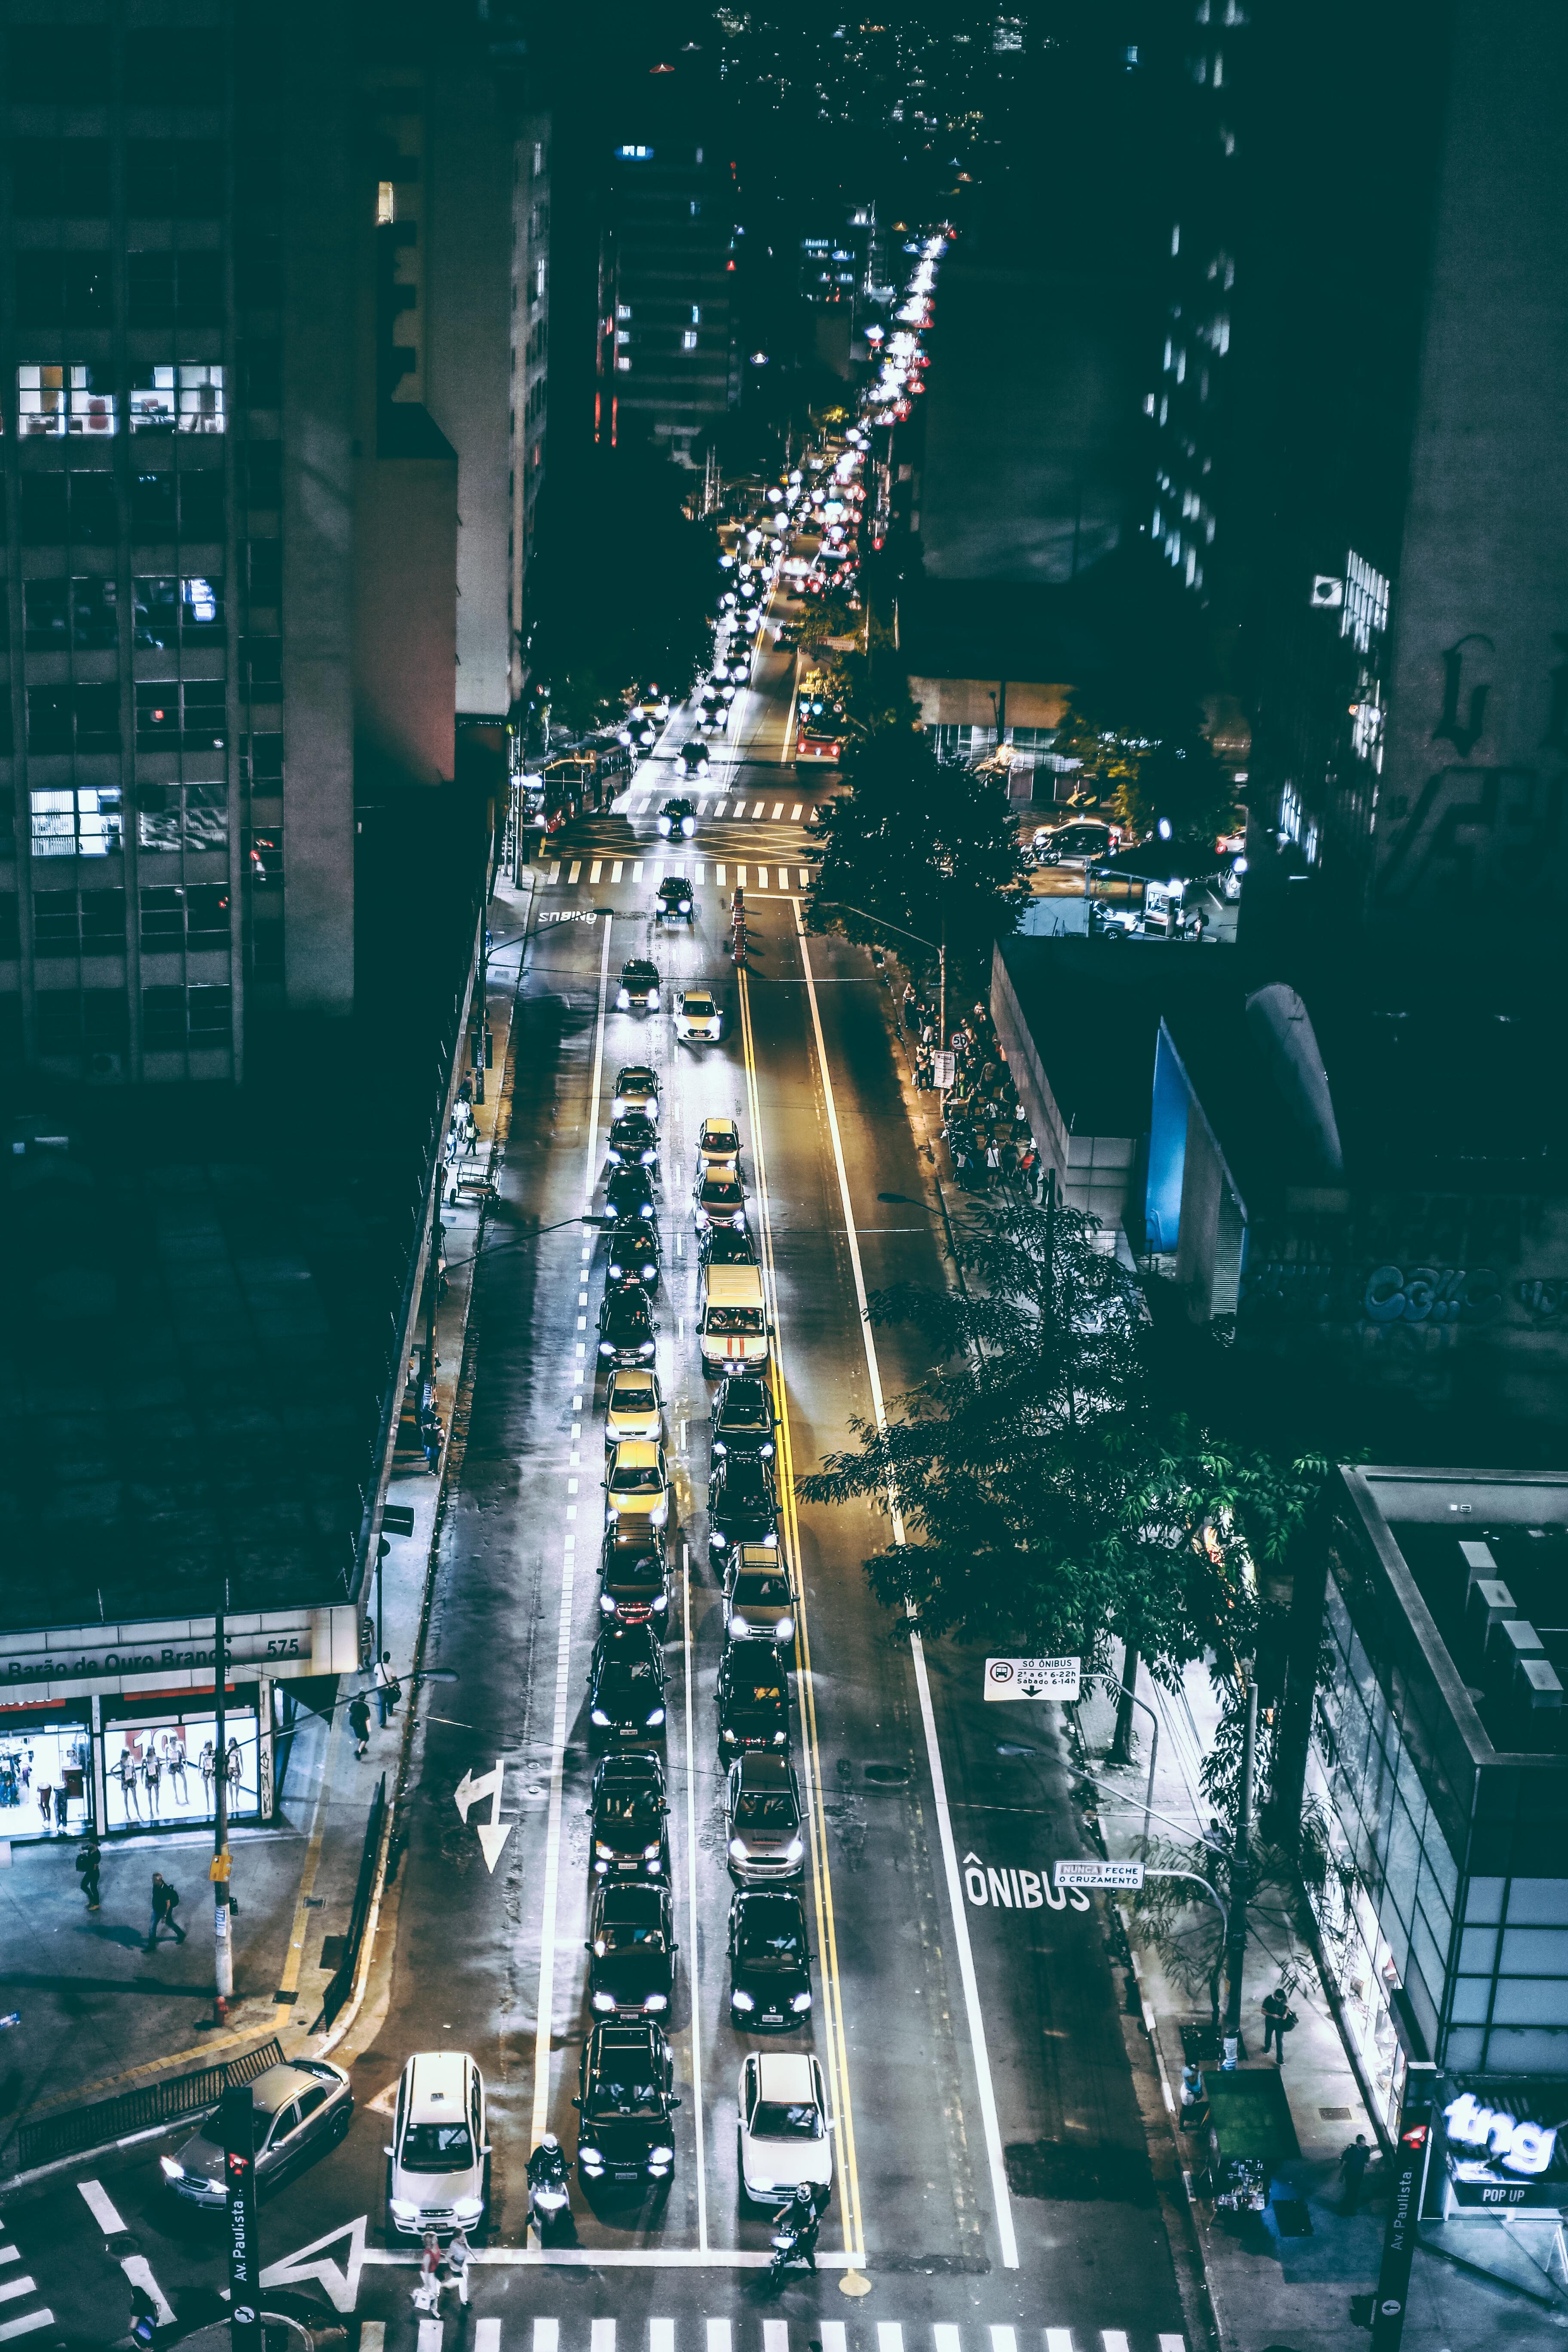 Cars on Black Asphalt Road during Nighttime